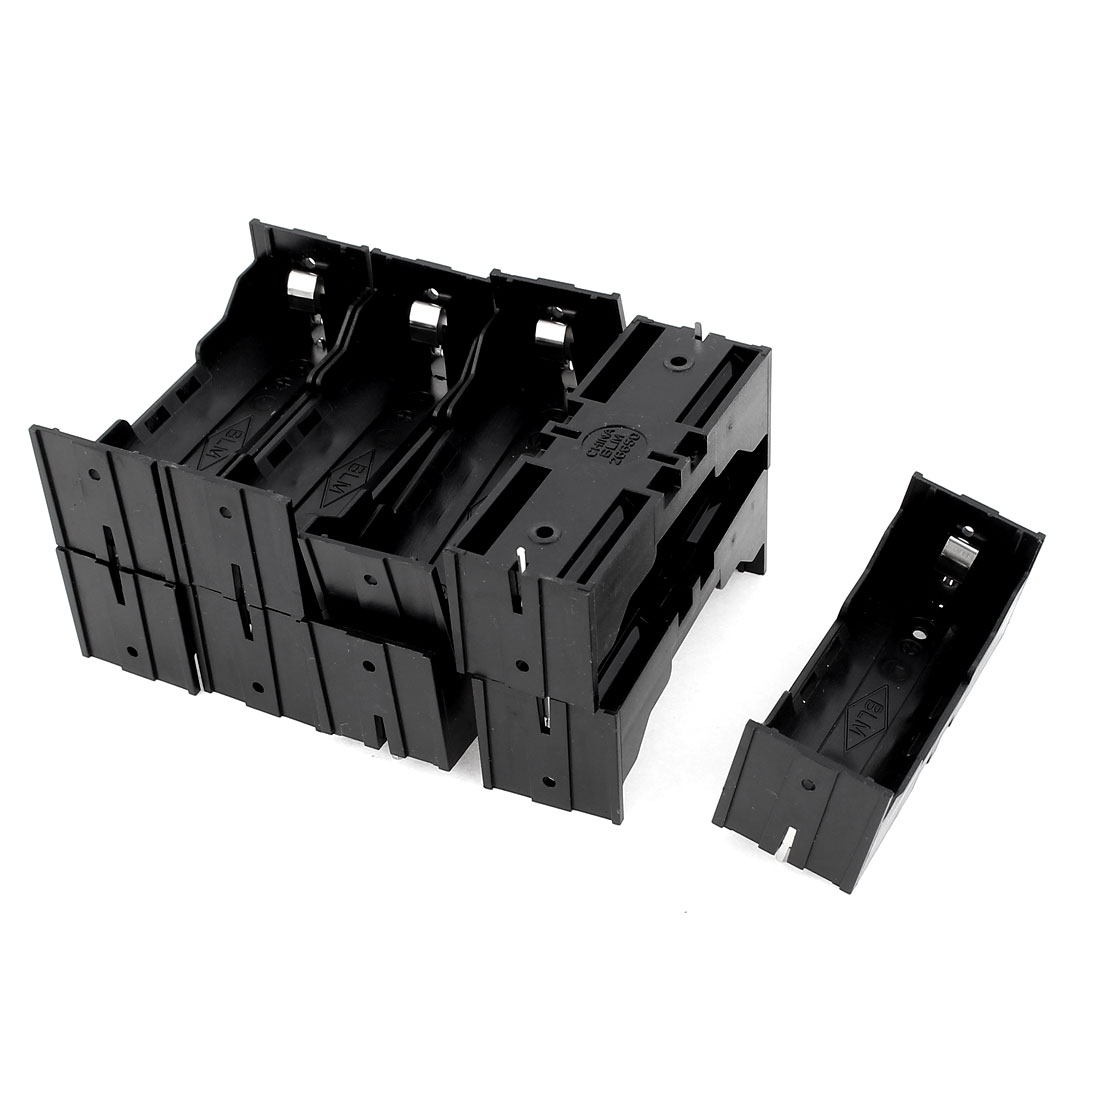 9Pcs Plastic Single 26650 Battery Holder Case Storage Box Black